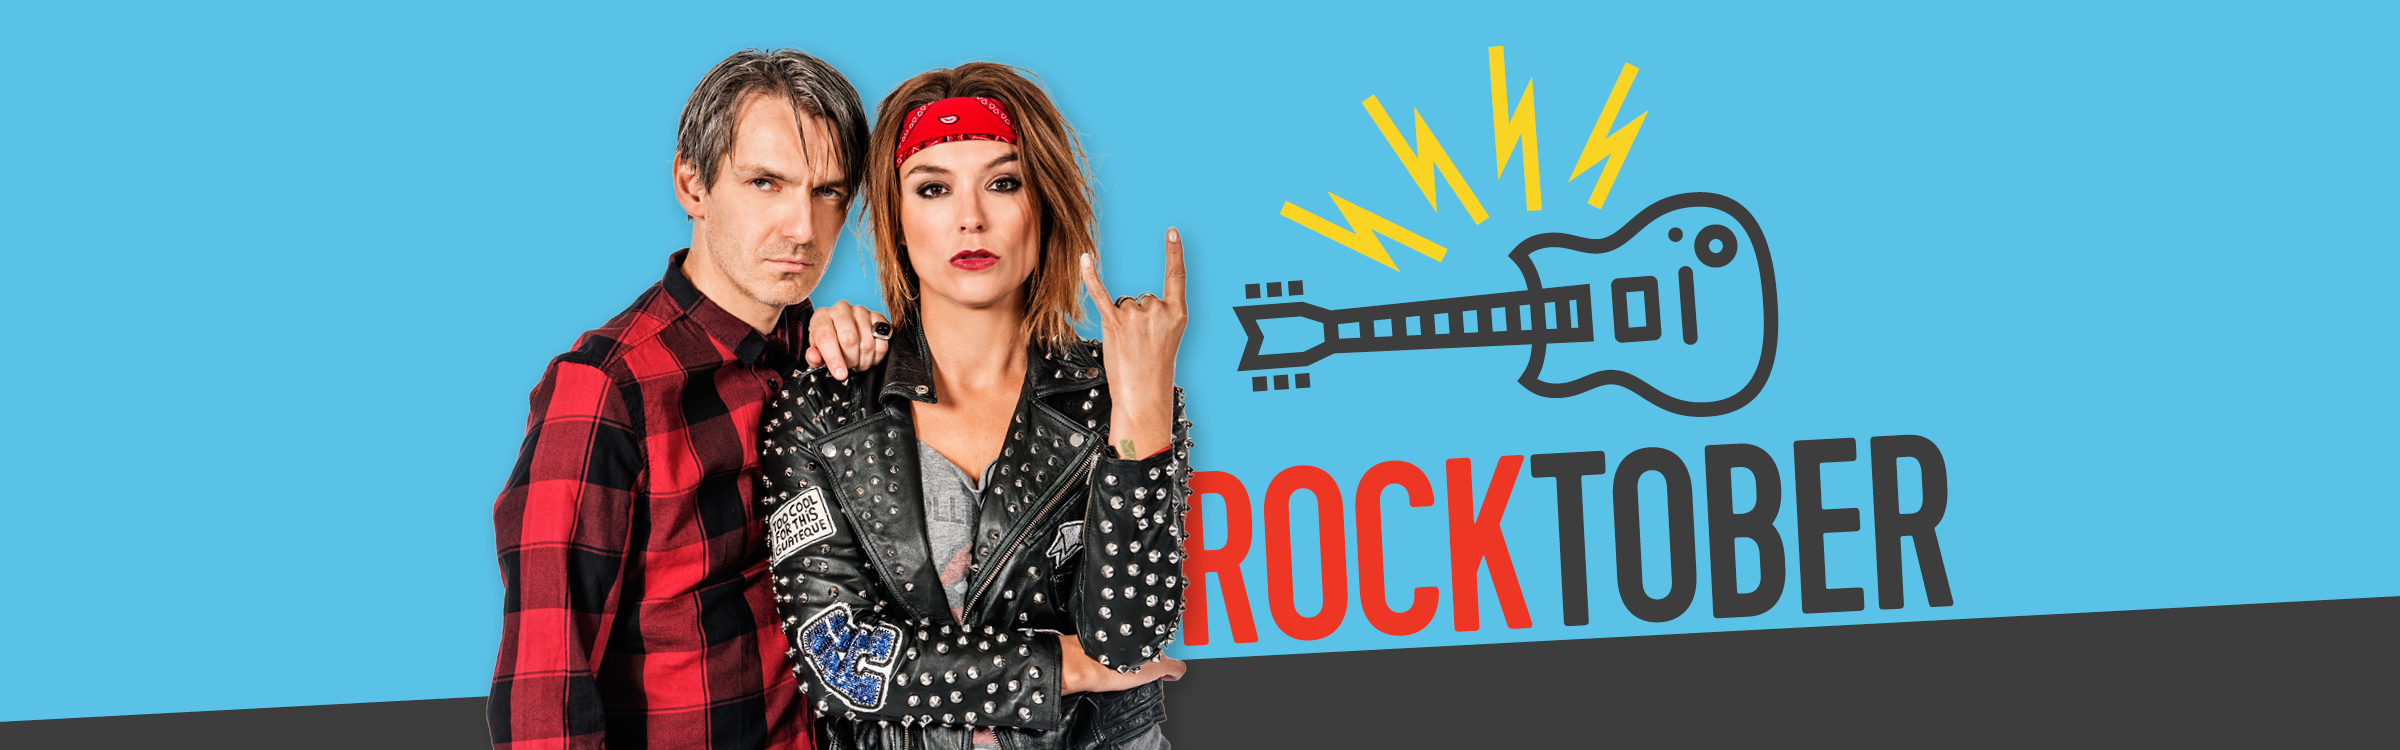 Rocktober 2400x750